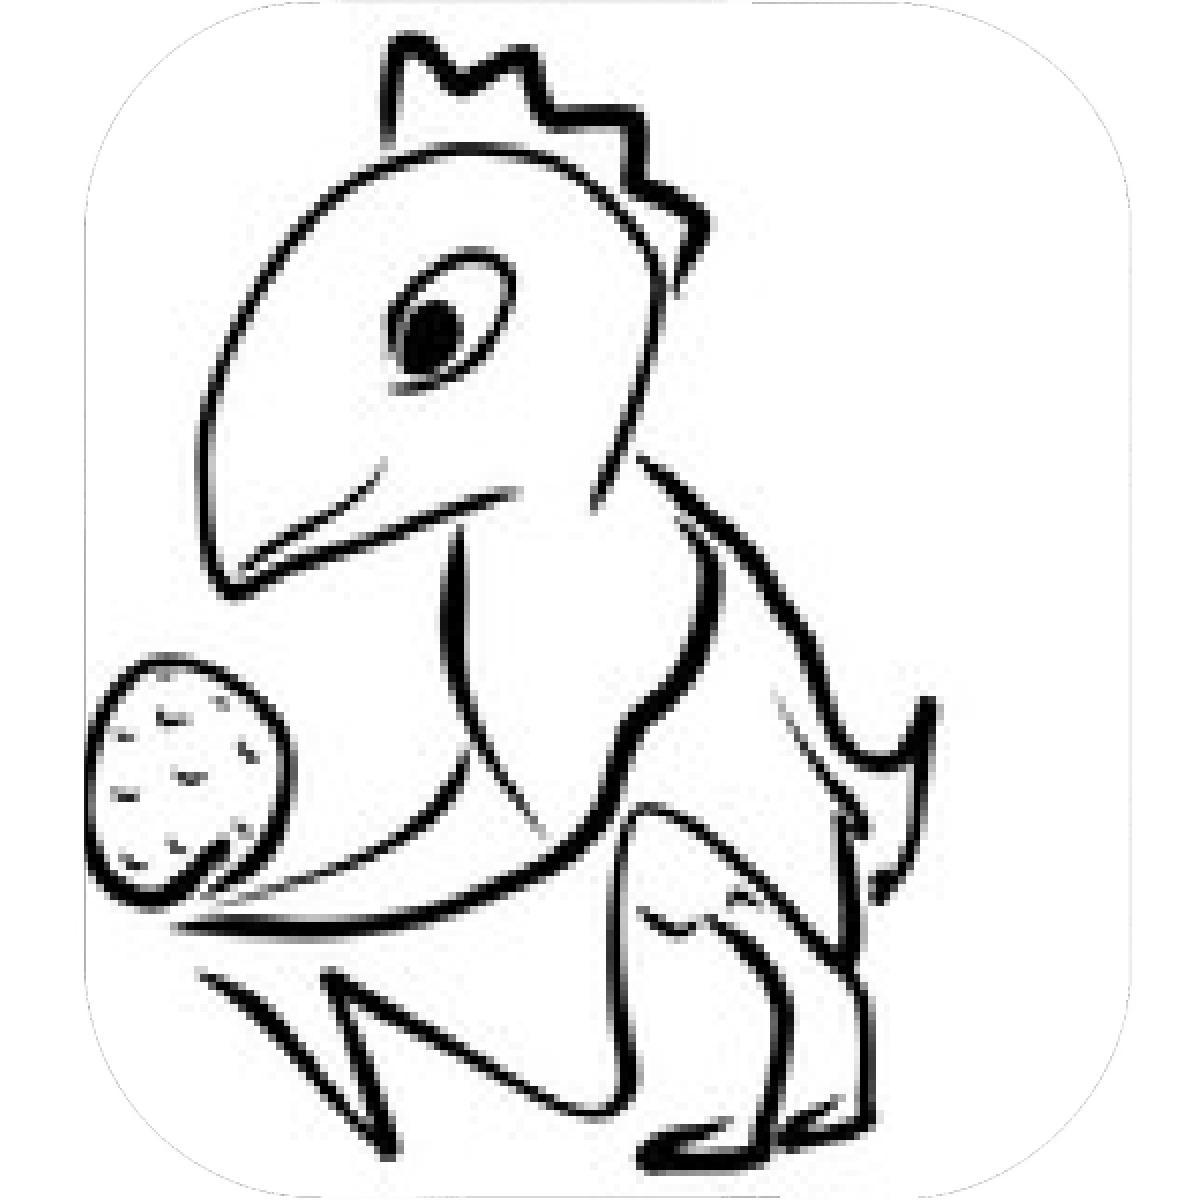 1200x1200 Dinosaur Eggs Coloring